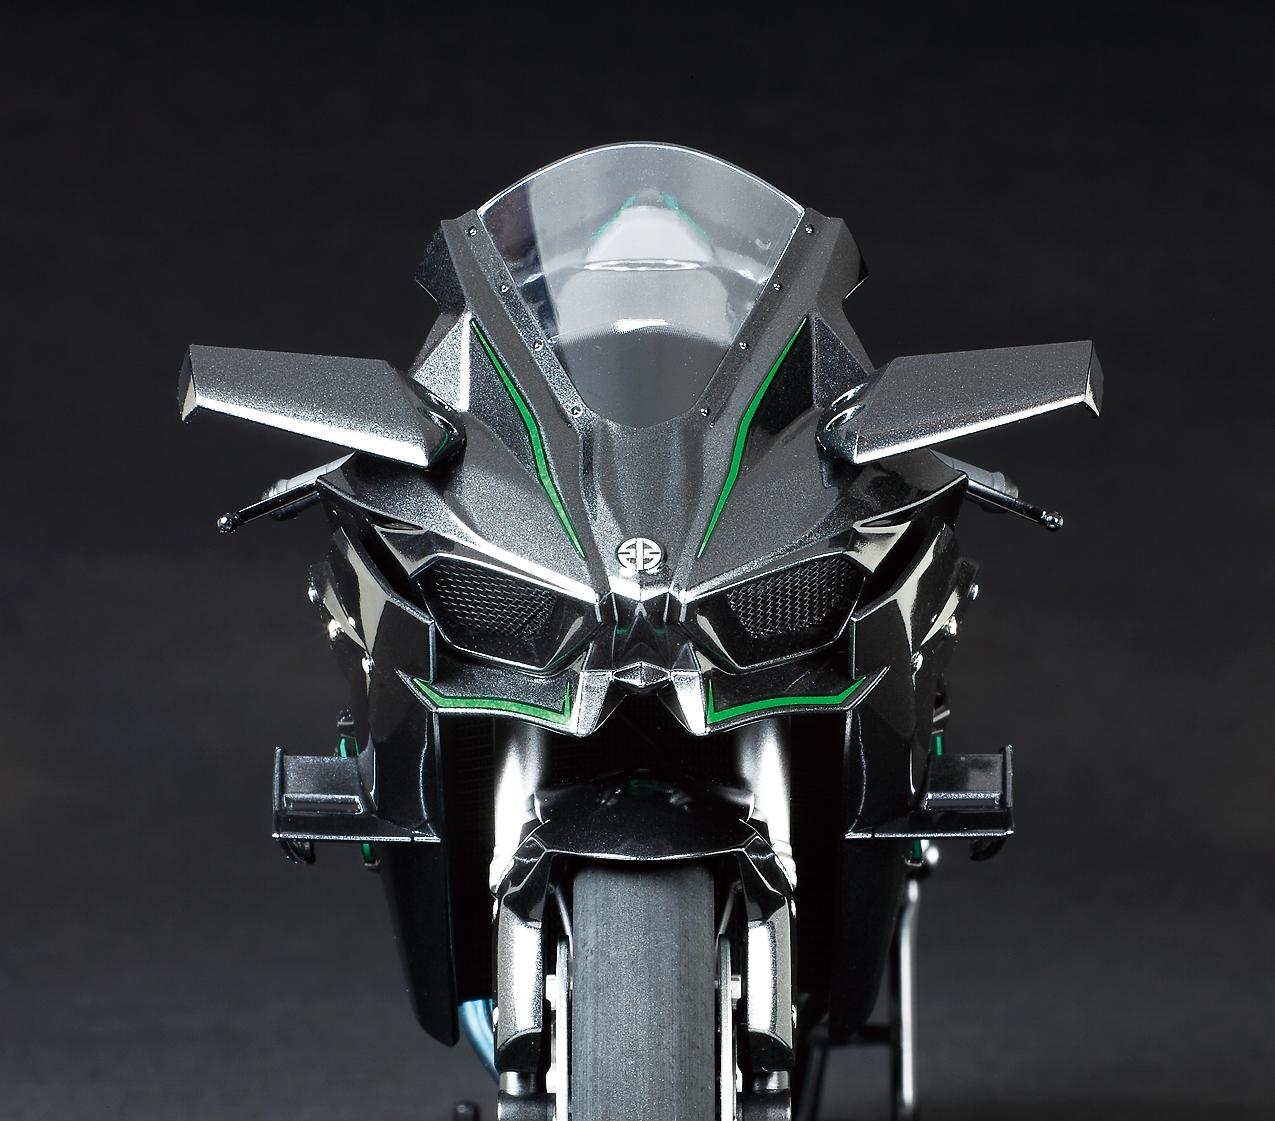 Kawasaki Ninja H2r 1275x1121 Wallpaper Teahub Io